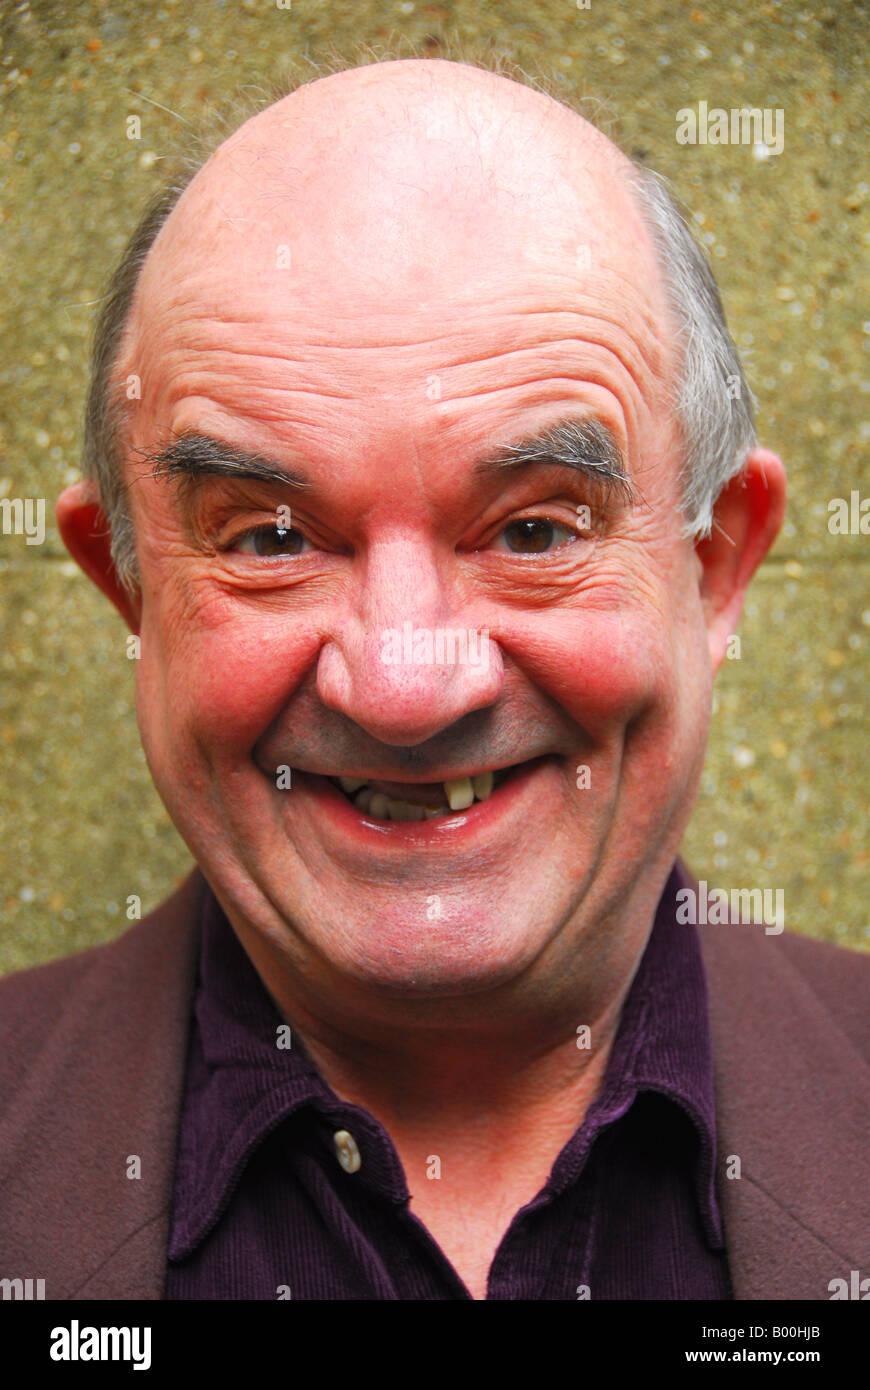 TEETLESS MAN IN HIS 70`s SMILES WIDE - Stock Image